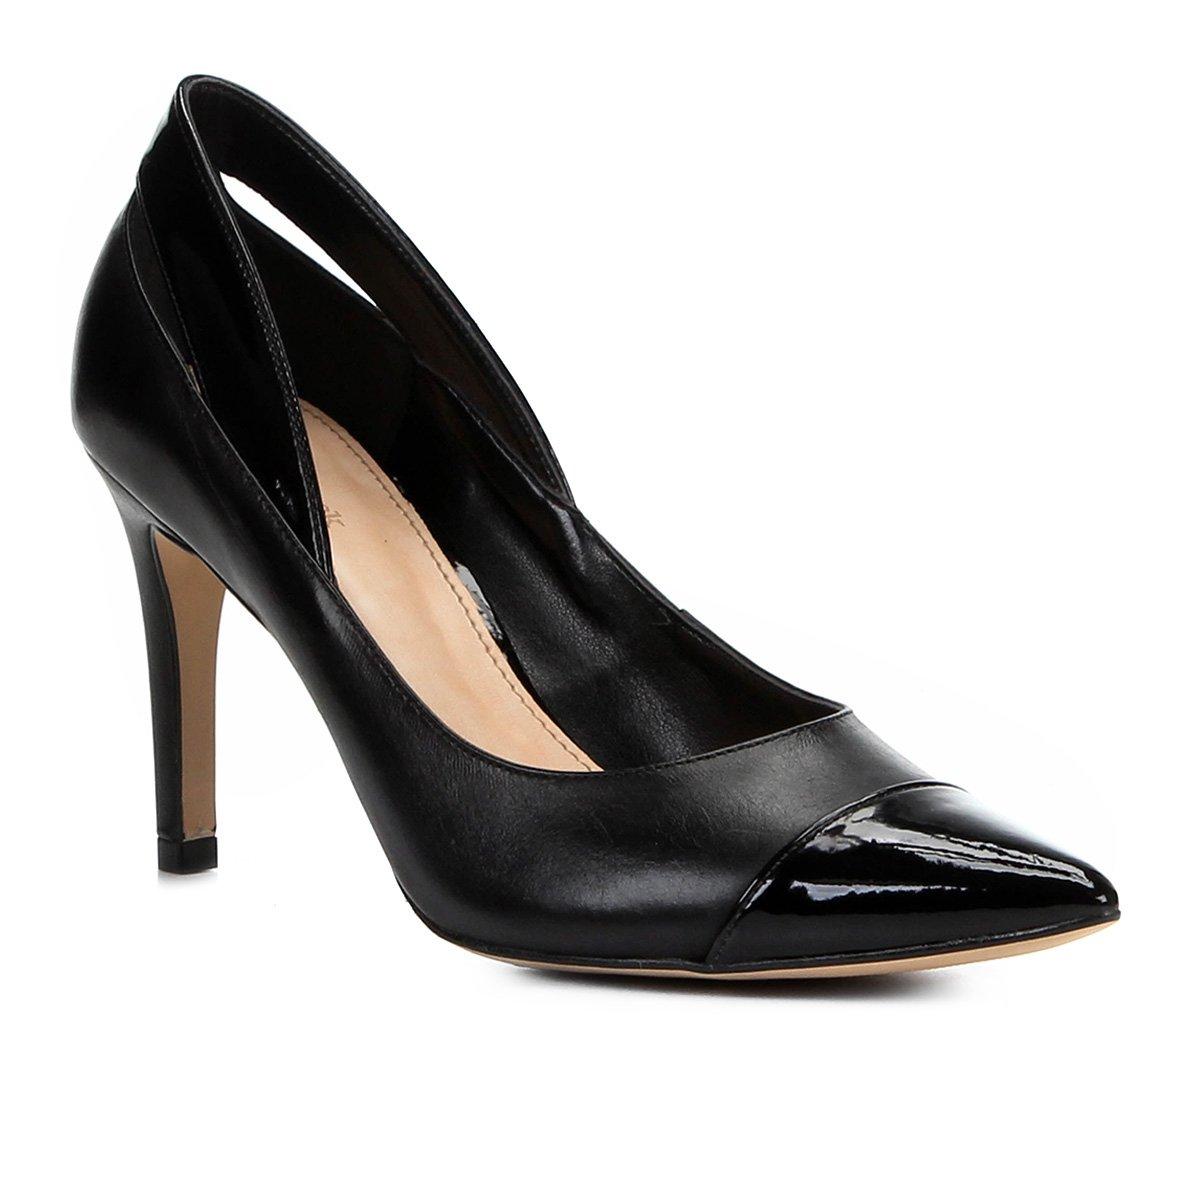 6a1ee5004c Scarpin Shoestock Salto Alto Detalhes Verniz - Preto